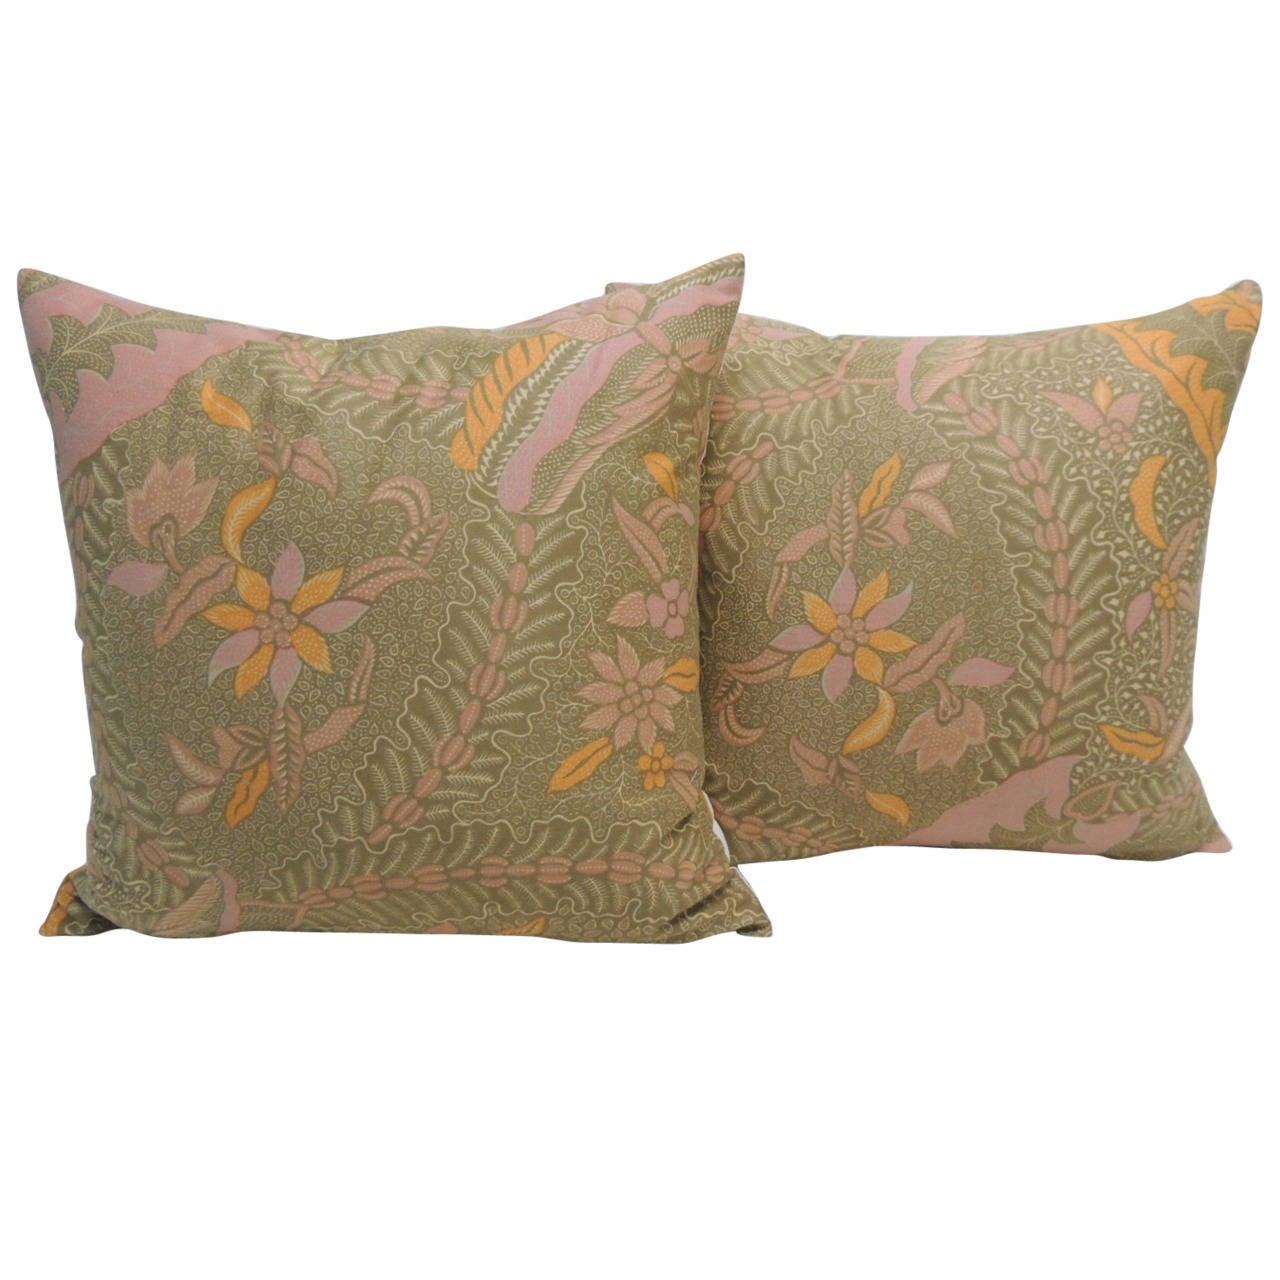 Pair of Orange and Pink Batik Orange and Pink Decorative Pillows